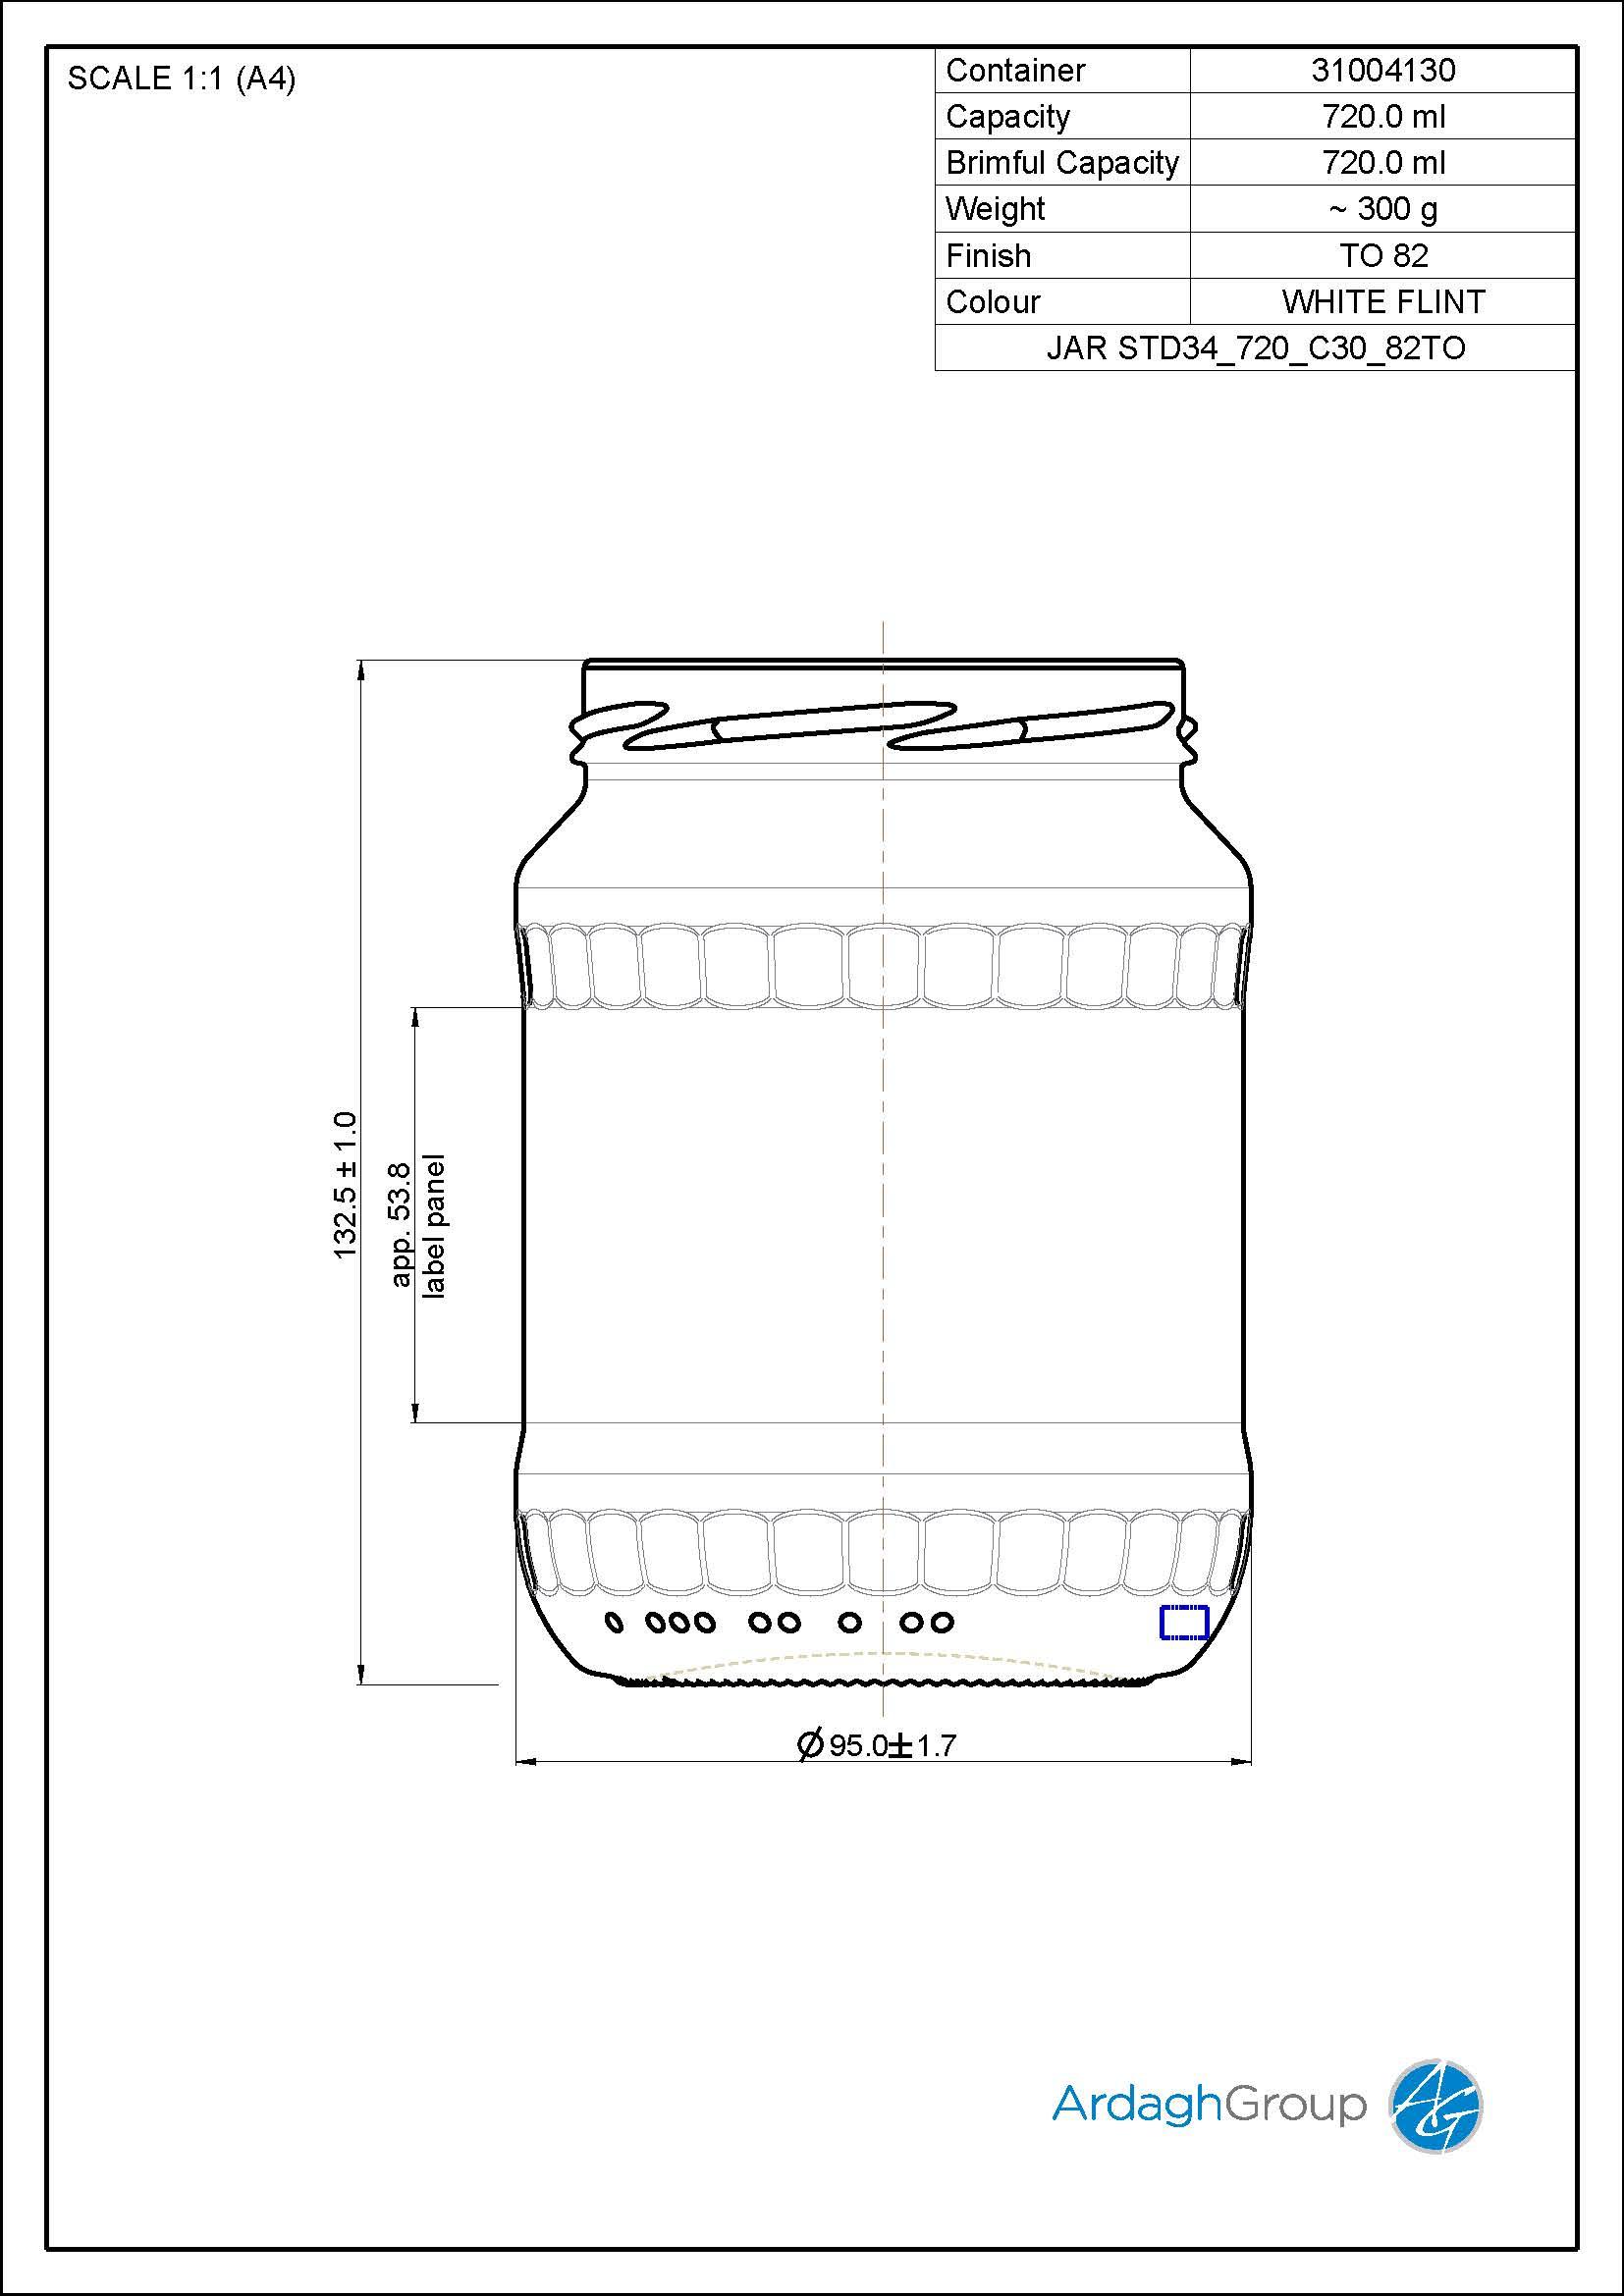 Jar STD34 720 C30 82TO